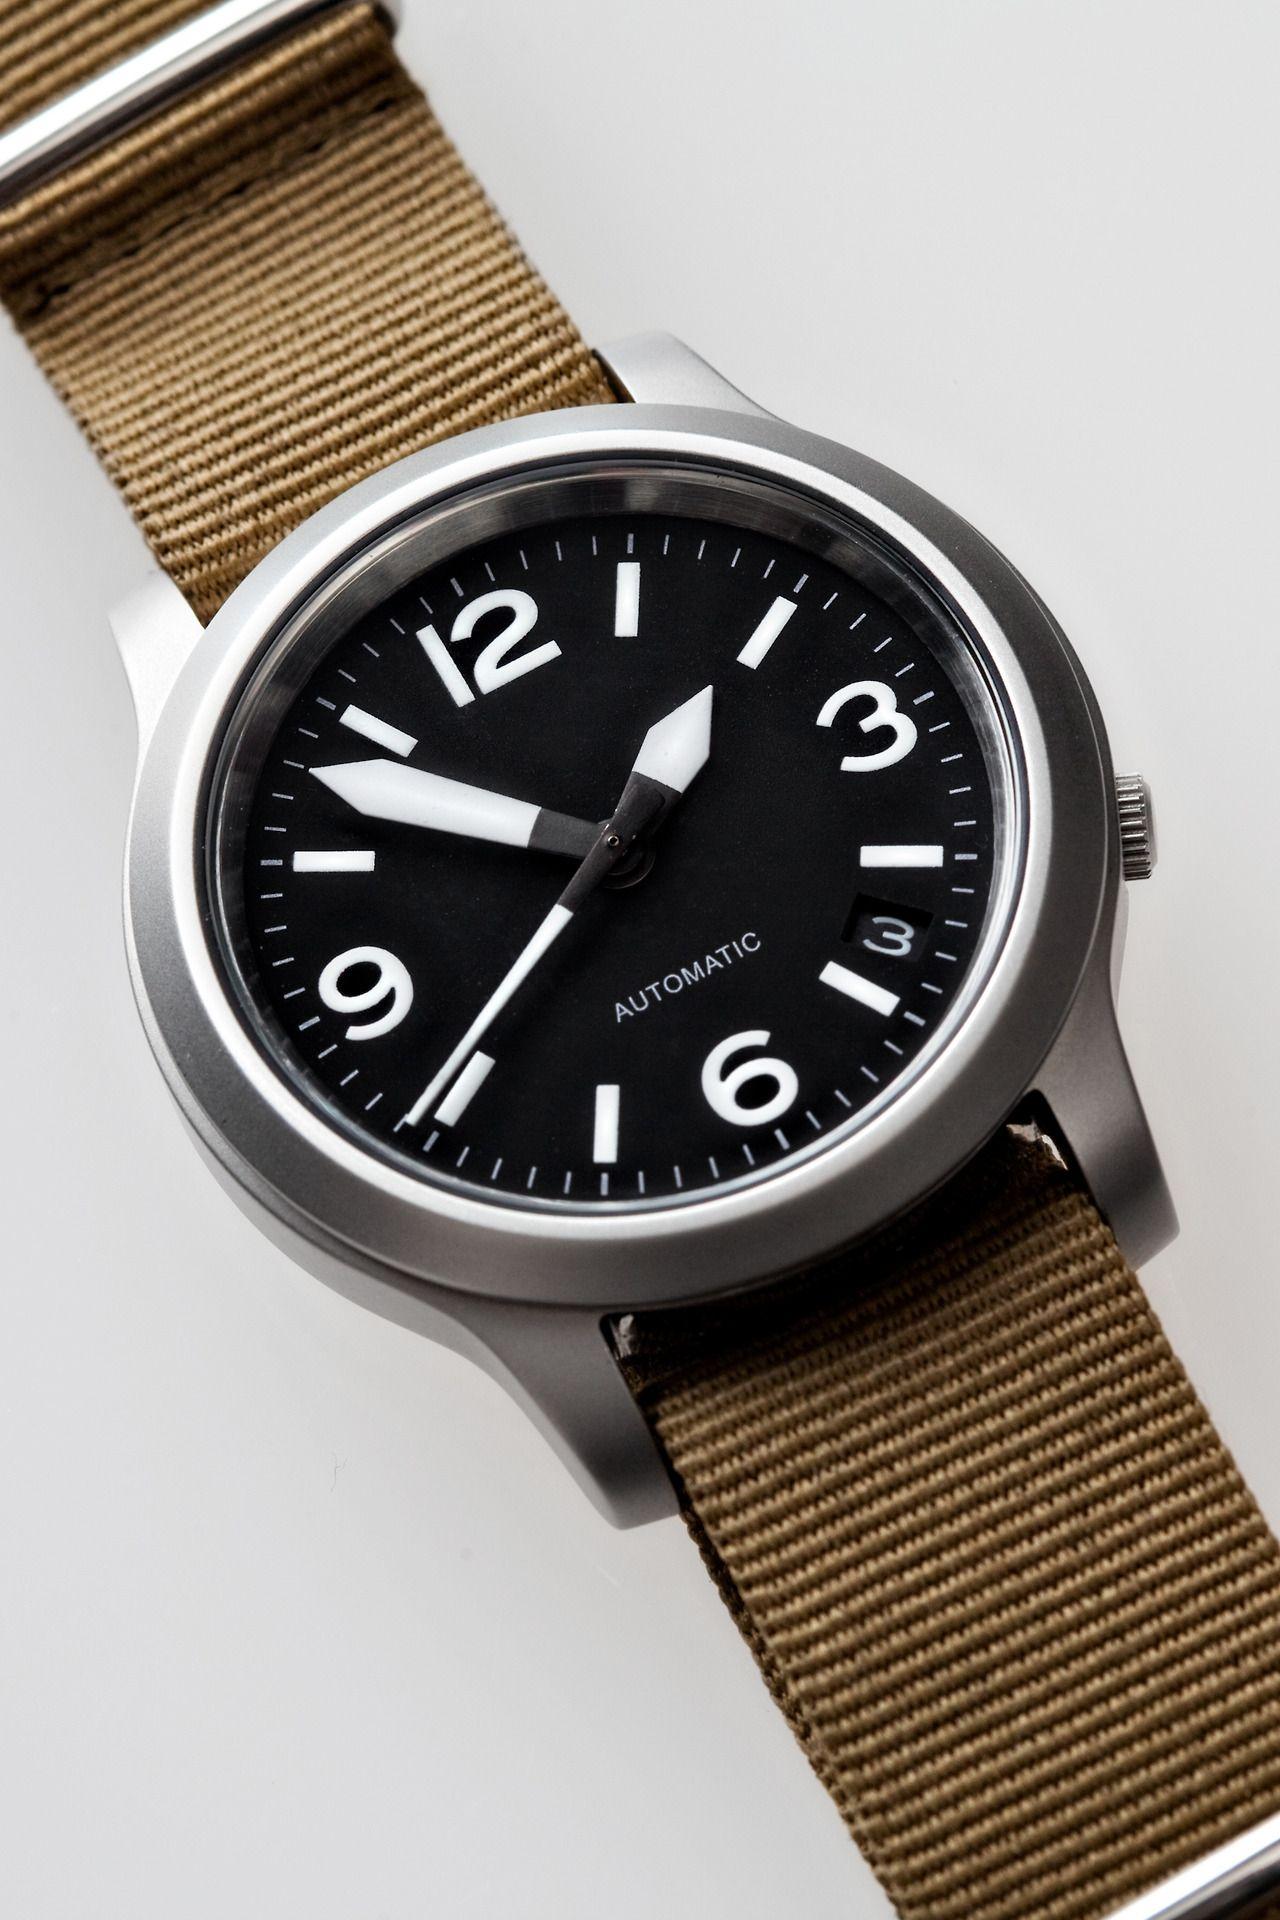 Cogito Ergo Sum Photo Military Watches Watches For Men Custom Watch